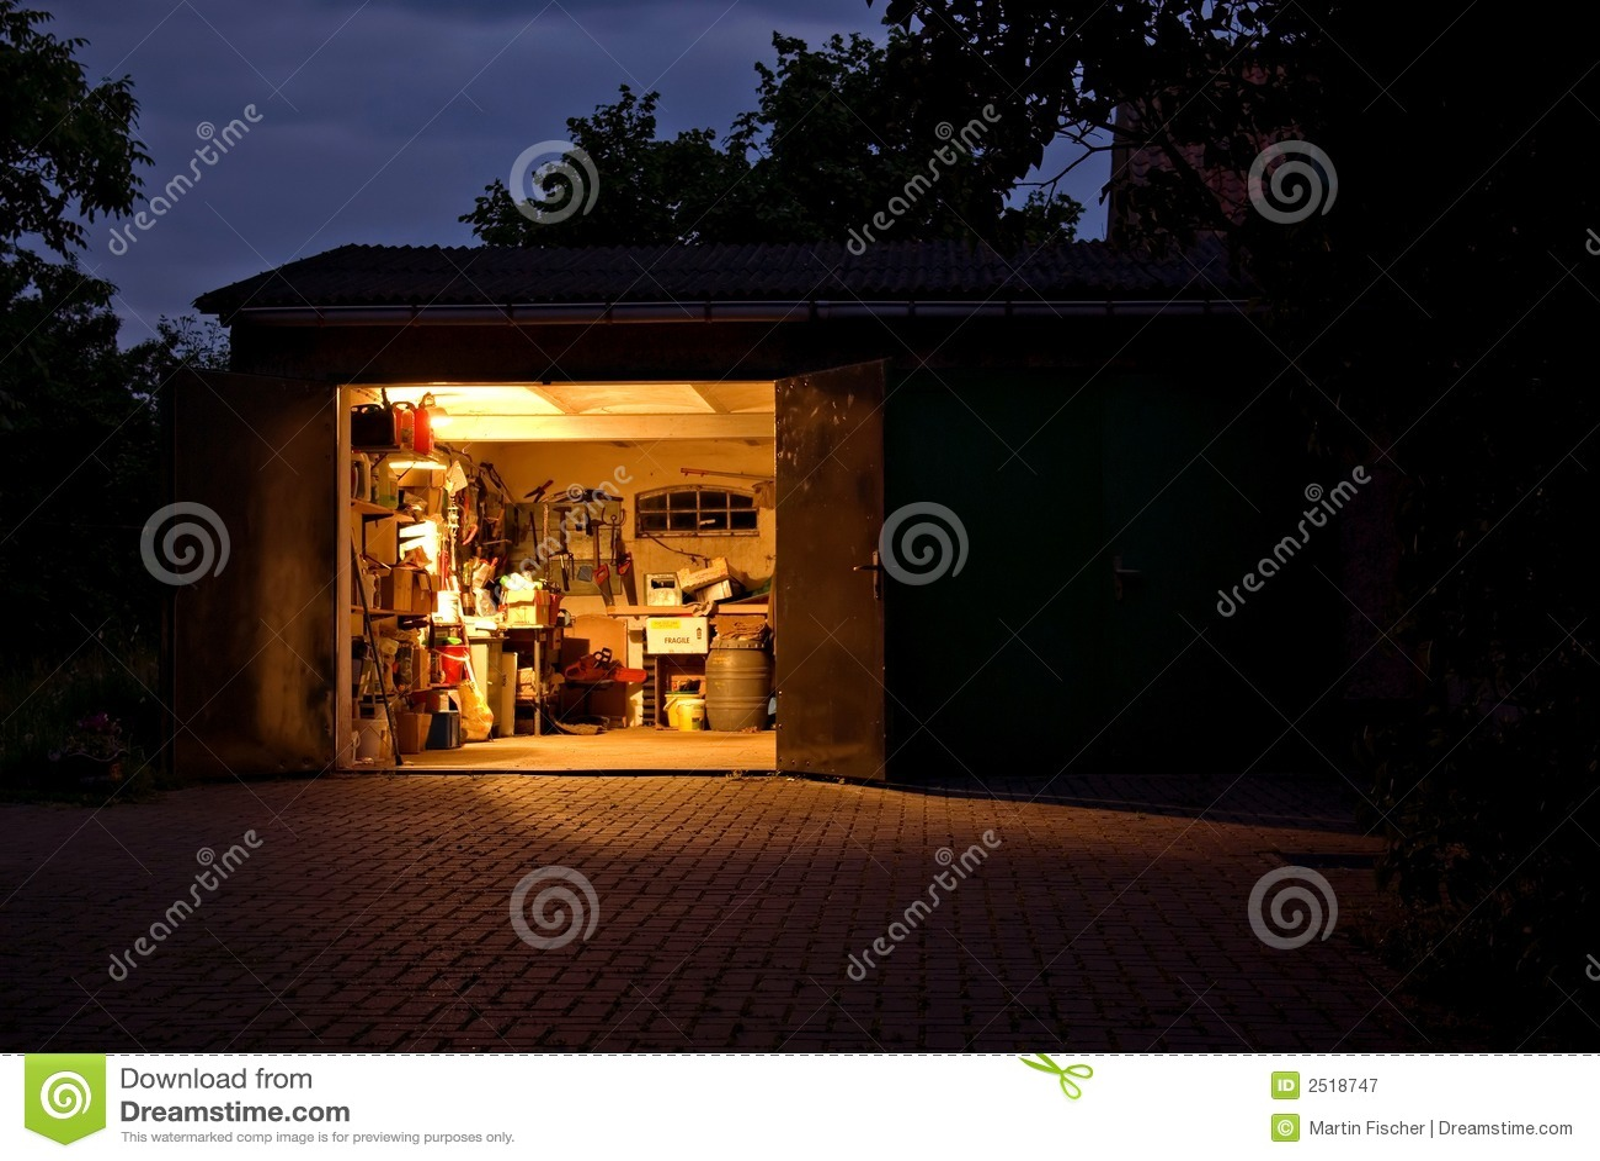 Garage workshop at night stock image Image of make lights  2518747